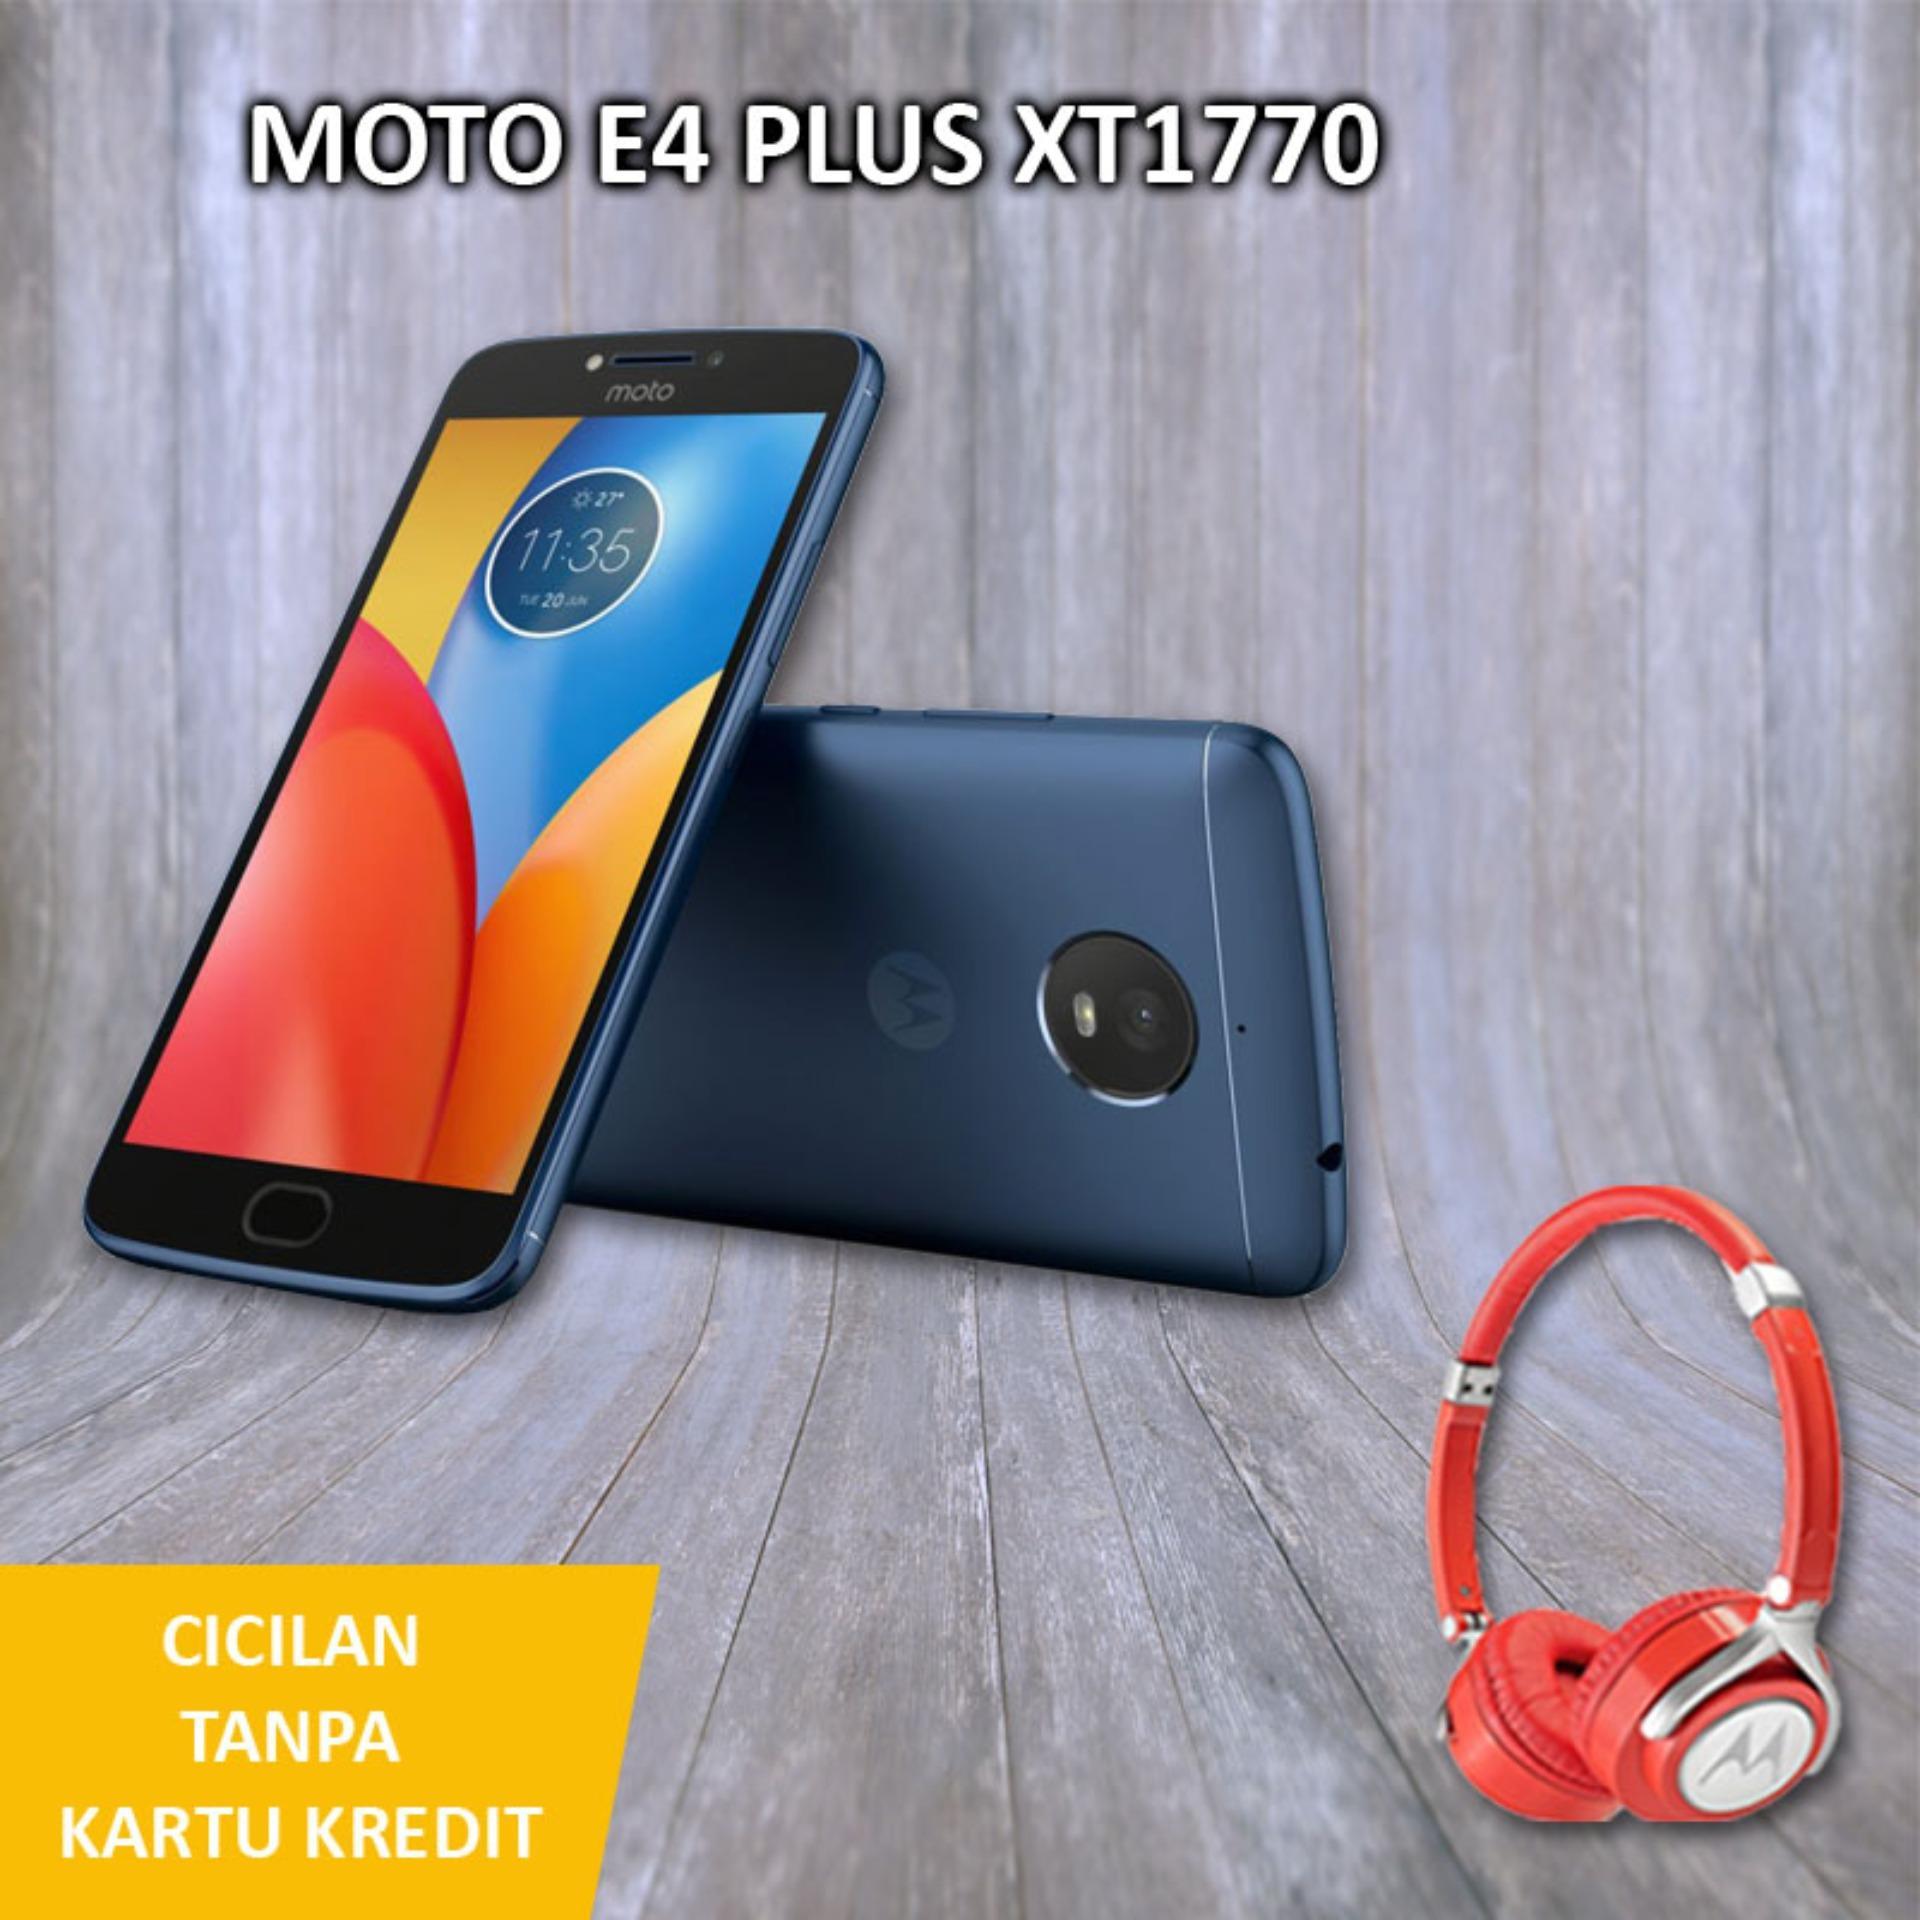 Motorola Moto E4 Plus Smartphone - [32GB/3GB] + Free Headphone